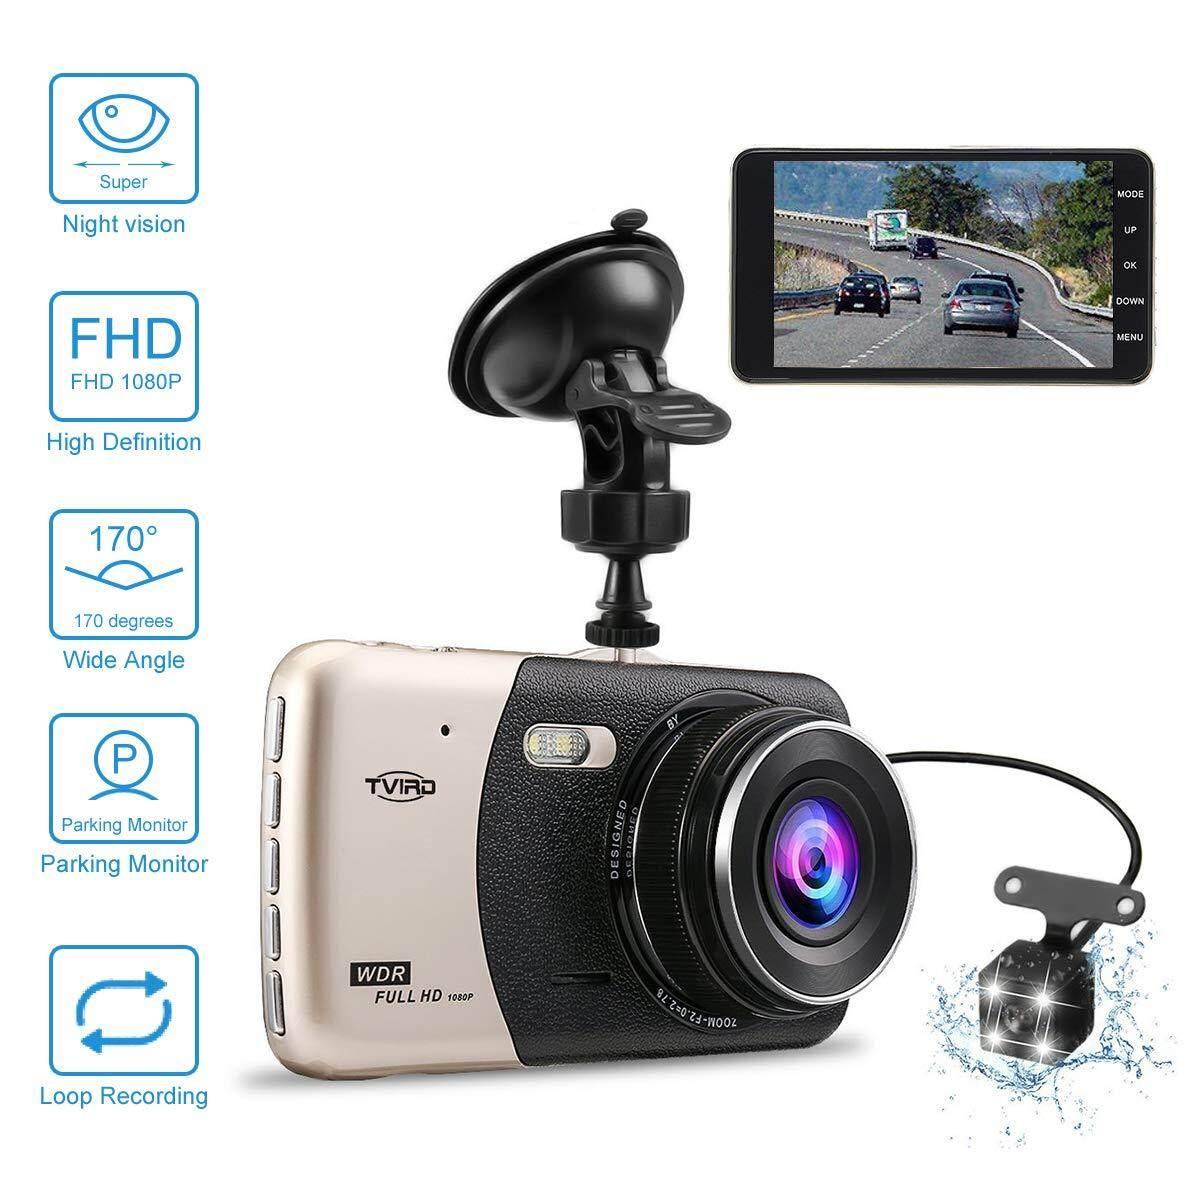 Dash CAM FHD 1080 P 4.0 ''IPS หน้าจอ 170 ° มุมกว้างด้านหน้าและด้านหลังรถแบบมีสองเลนส์ Camera Dashboard Camera DVR G - Sensor การตรวจจับการเคลื่อนไหวที่จอดรถ